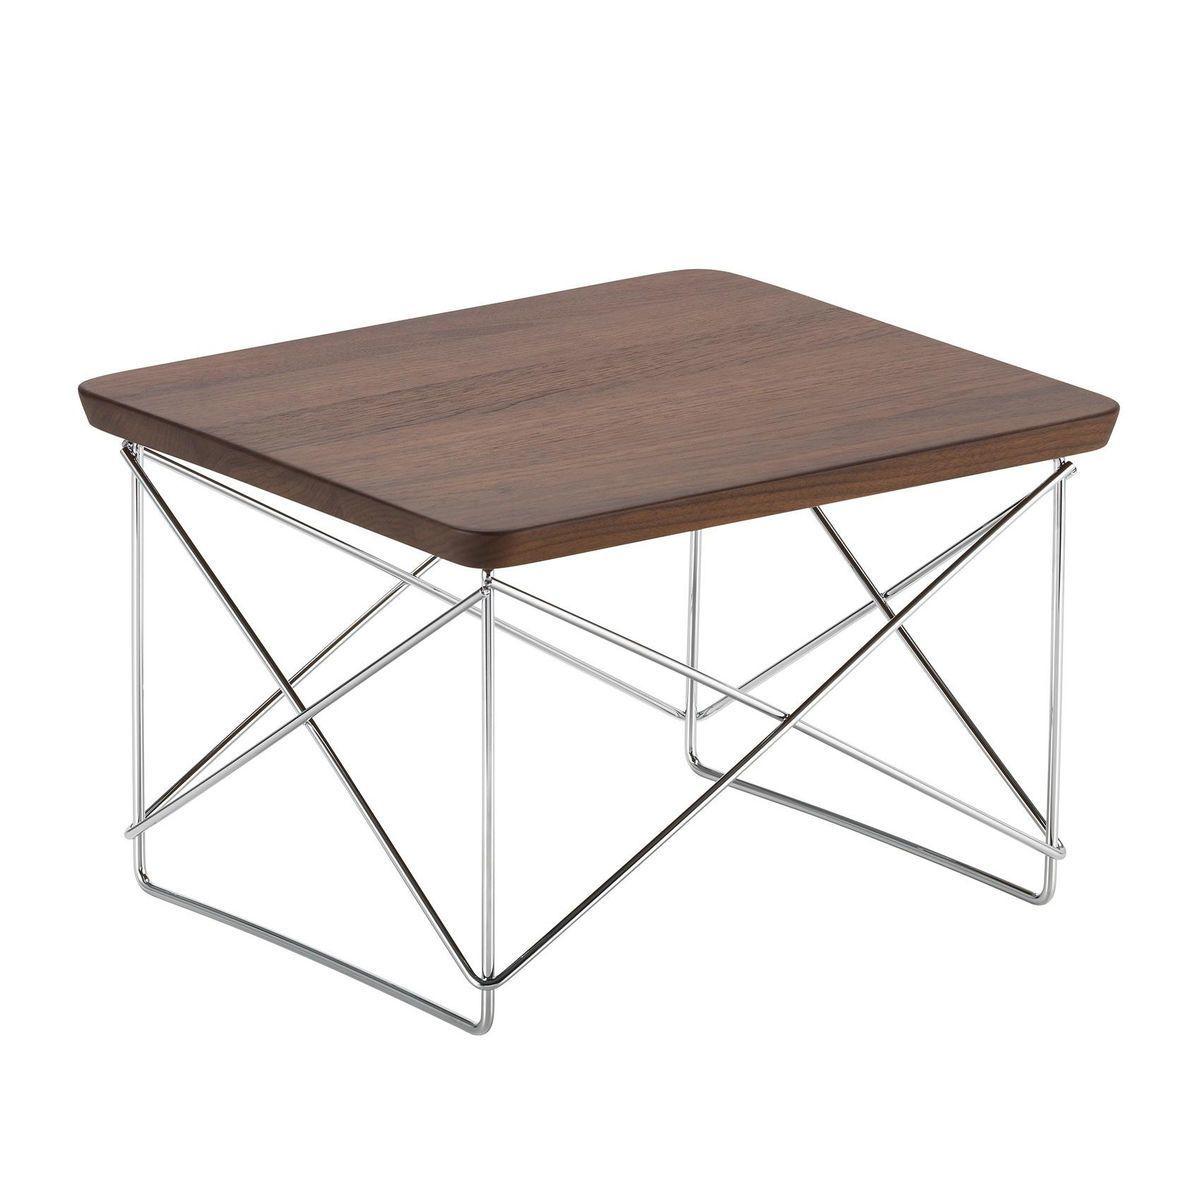 Occasional table ltr beistelltisch vitra for Beistelltisch vitra